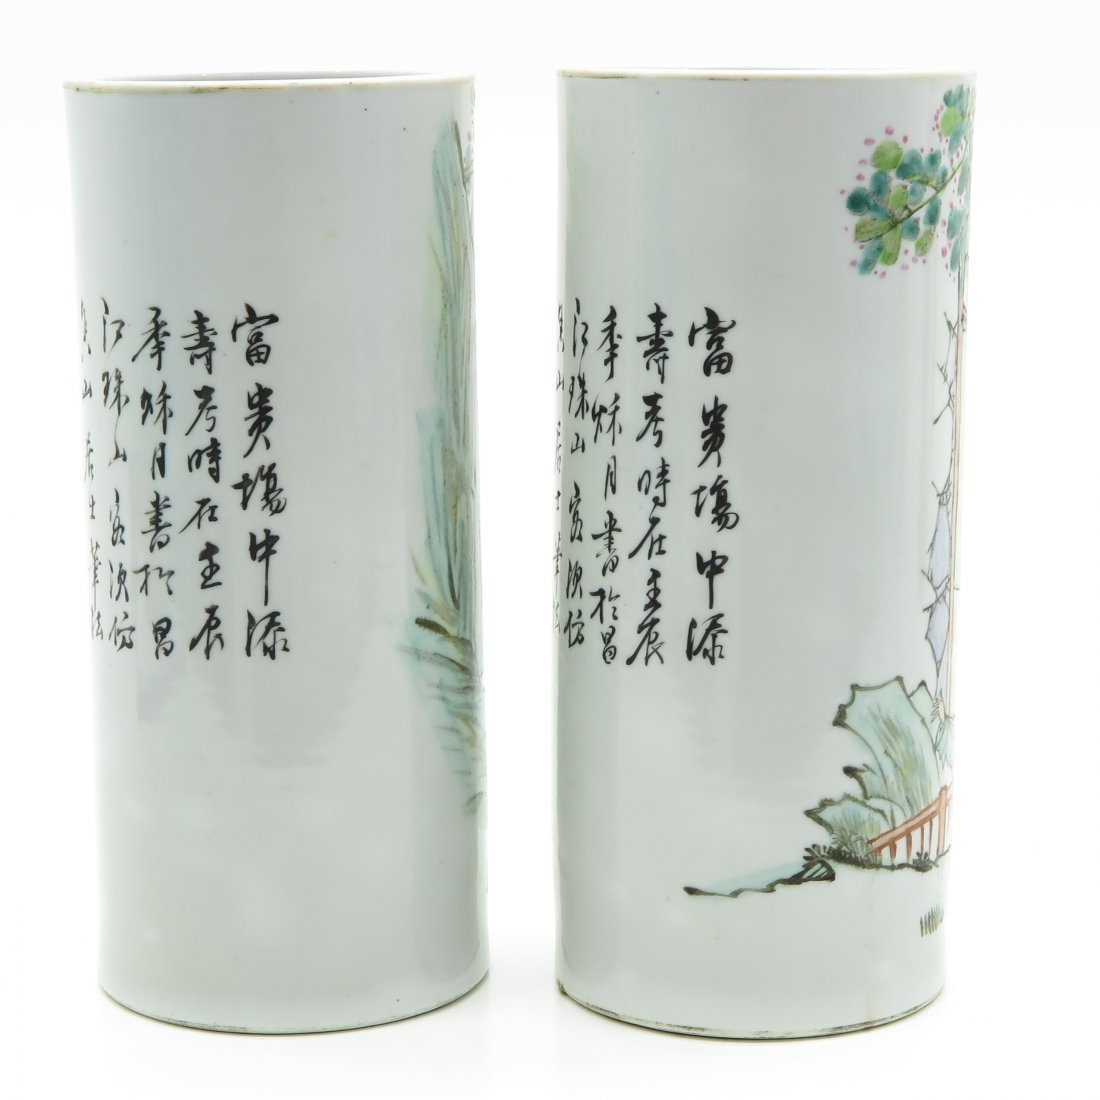 Lot of 2 China Porcelain Cylinder Roll Wagon Vases - 4